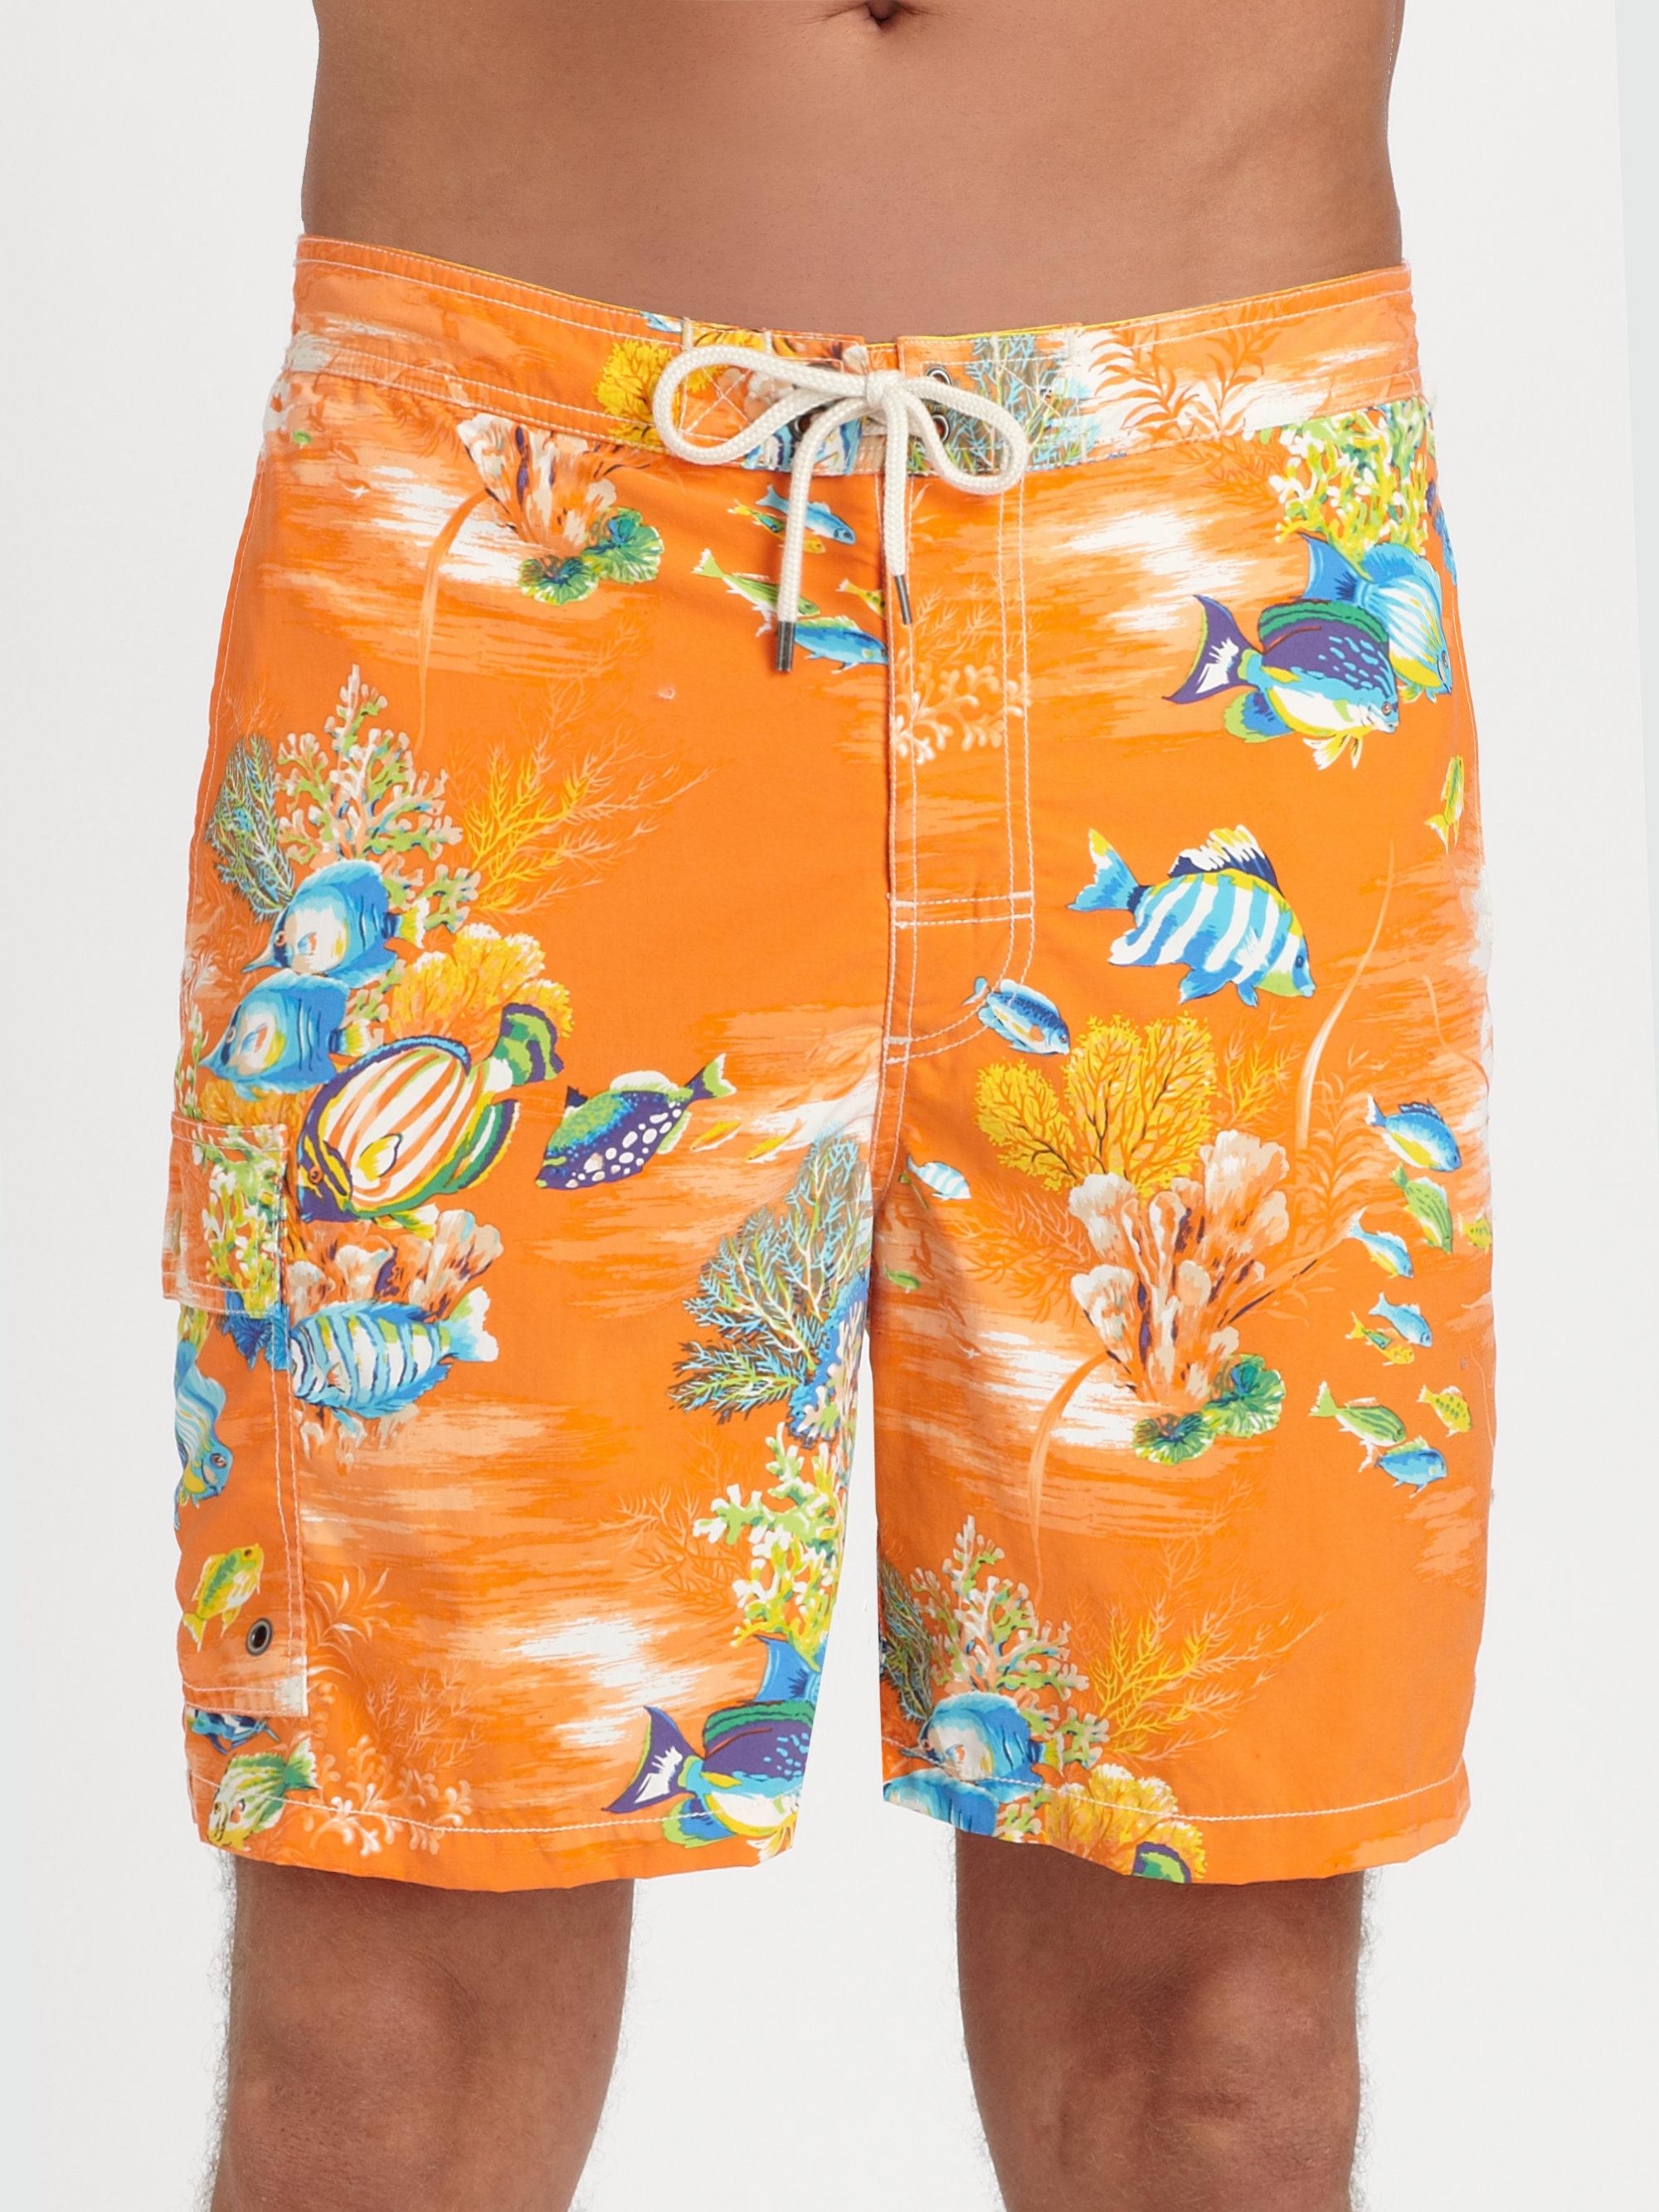 6508bc98ca924 ralph lauren new men clothing ralph lauren mens swim shorts